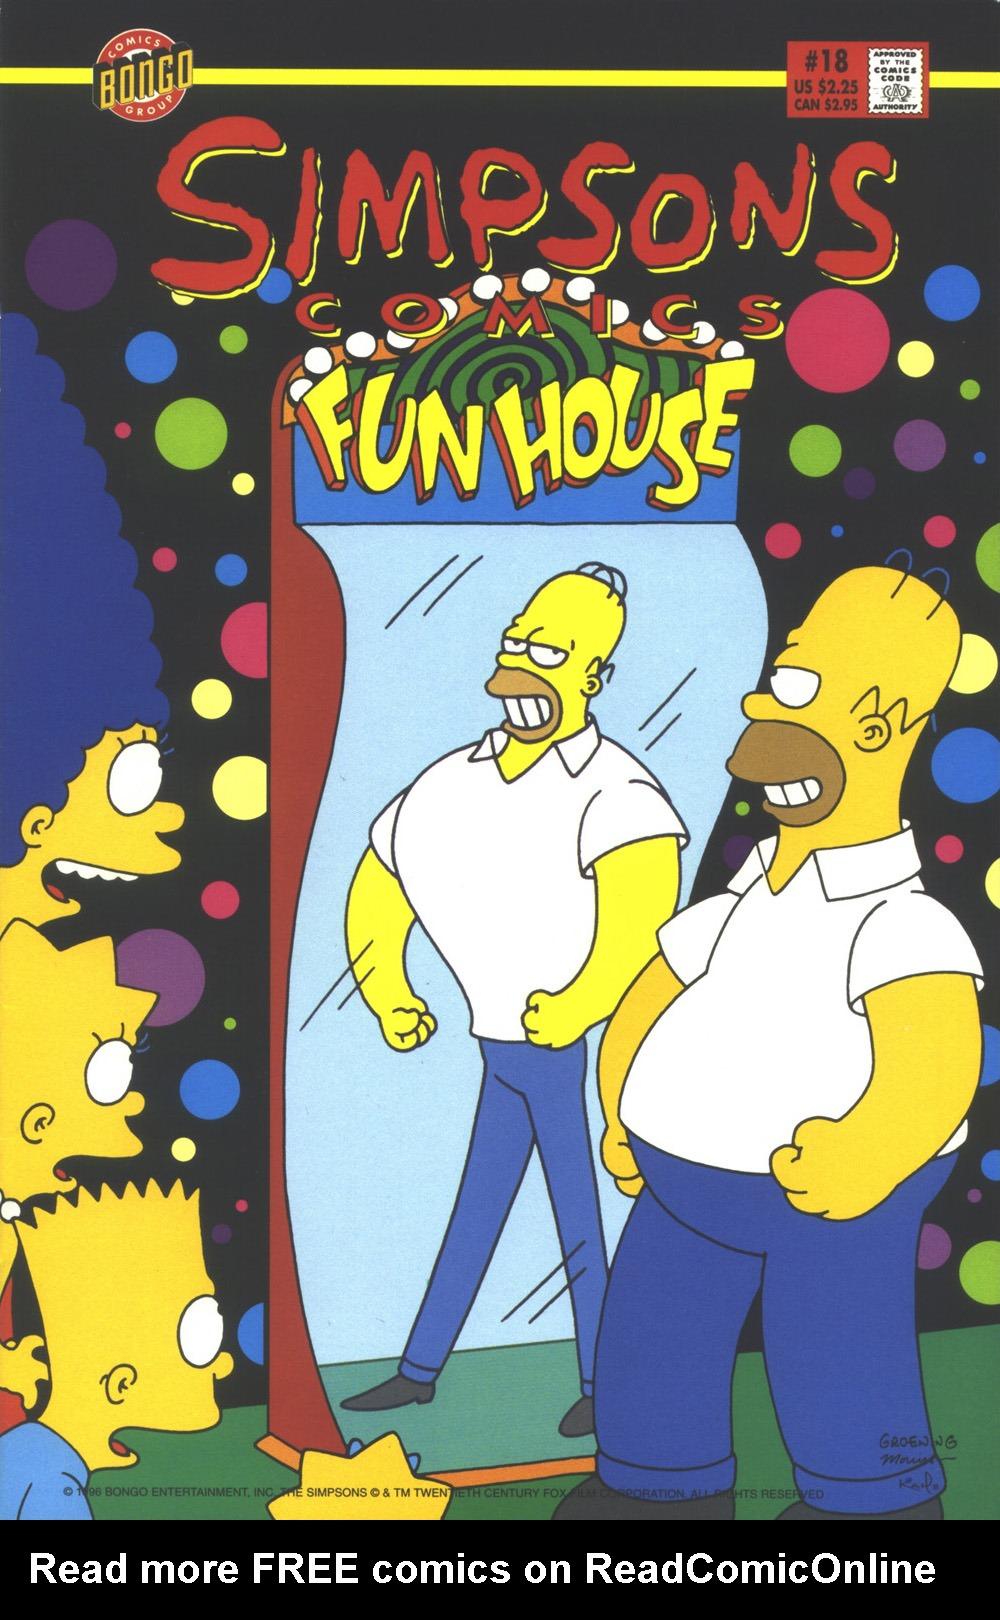 Read online Simpsons Comics comic -  Issue #18 - 1